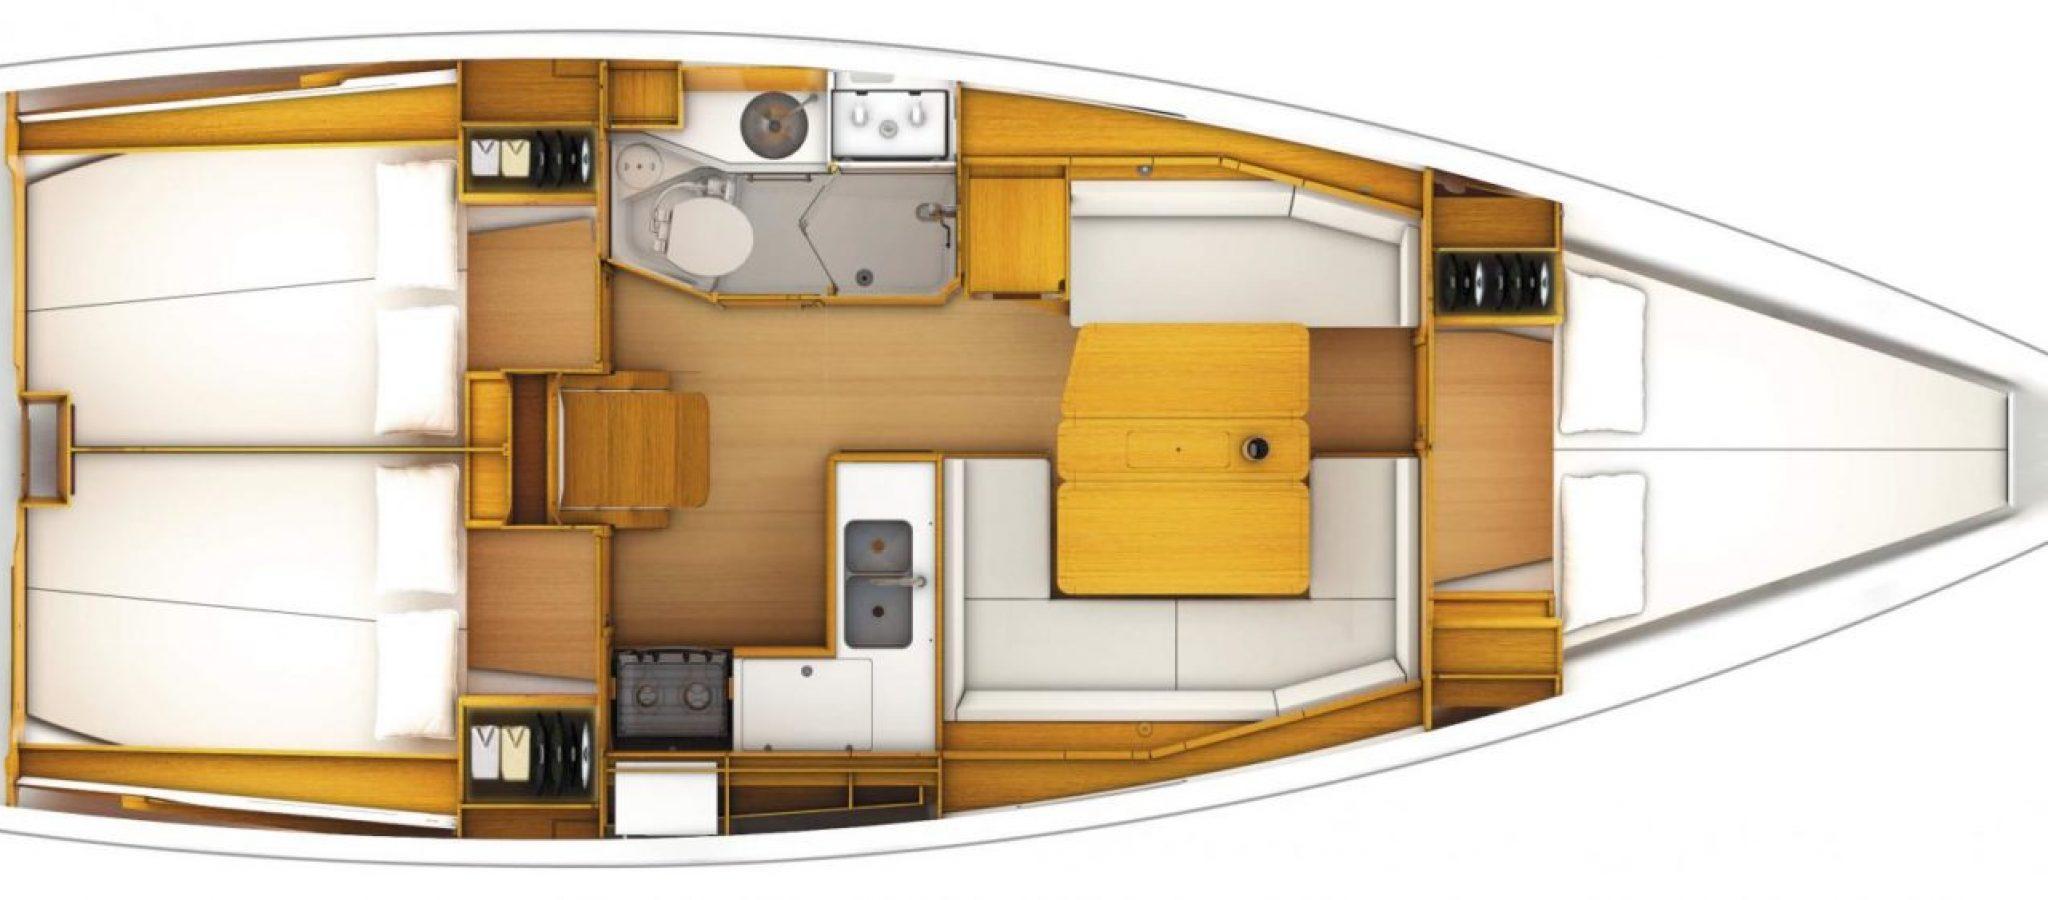 Sun Odyssey 389 plan 3 cabines